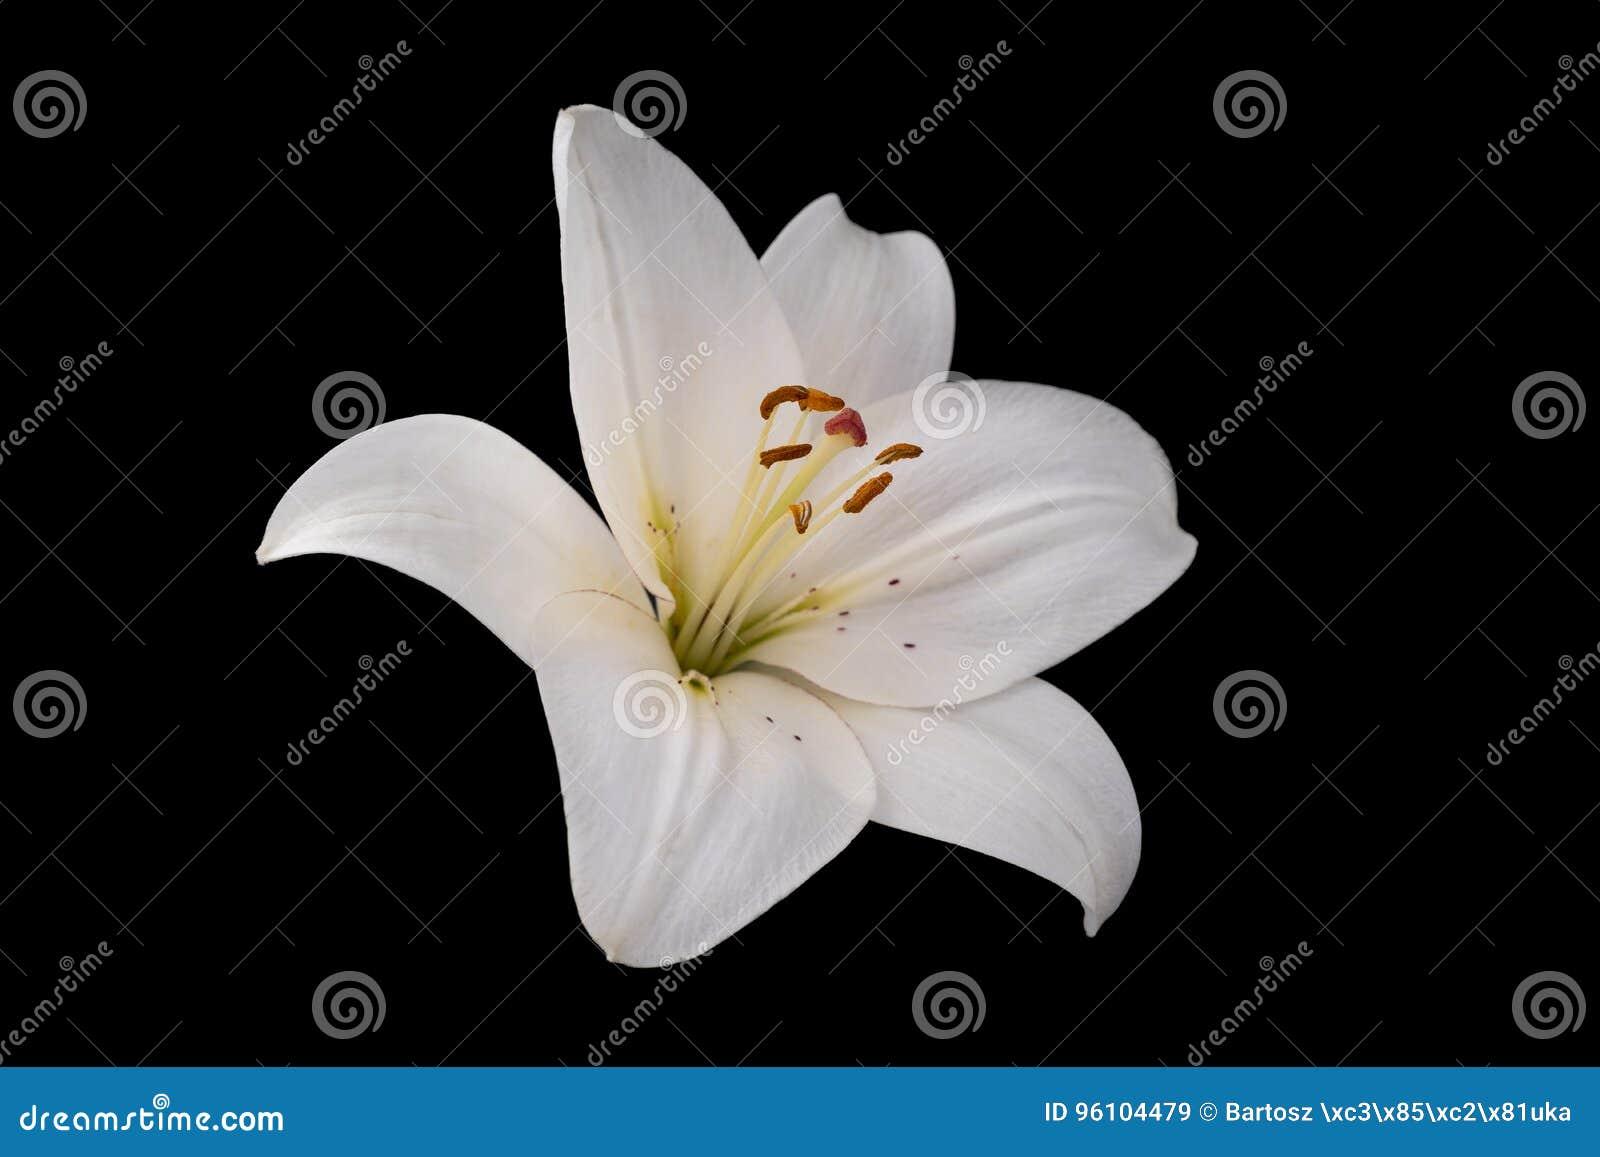 White lily flower on black background stock image image of lilly white lily flower on black background izmirmasajfo